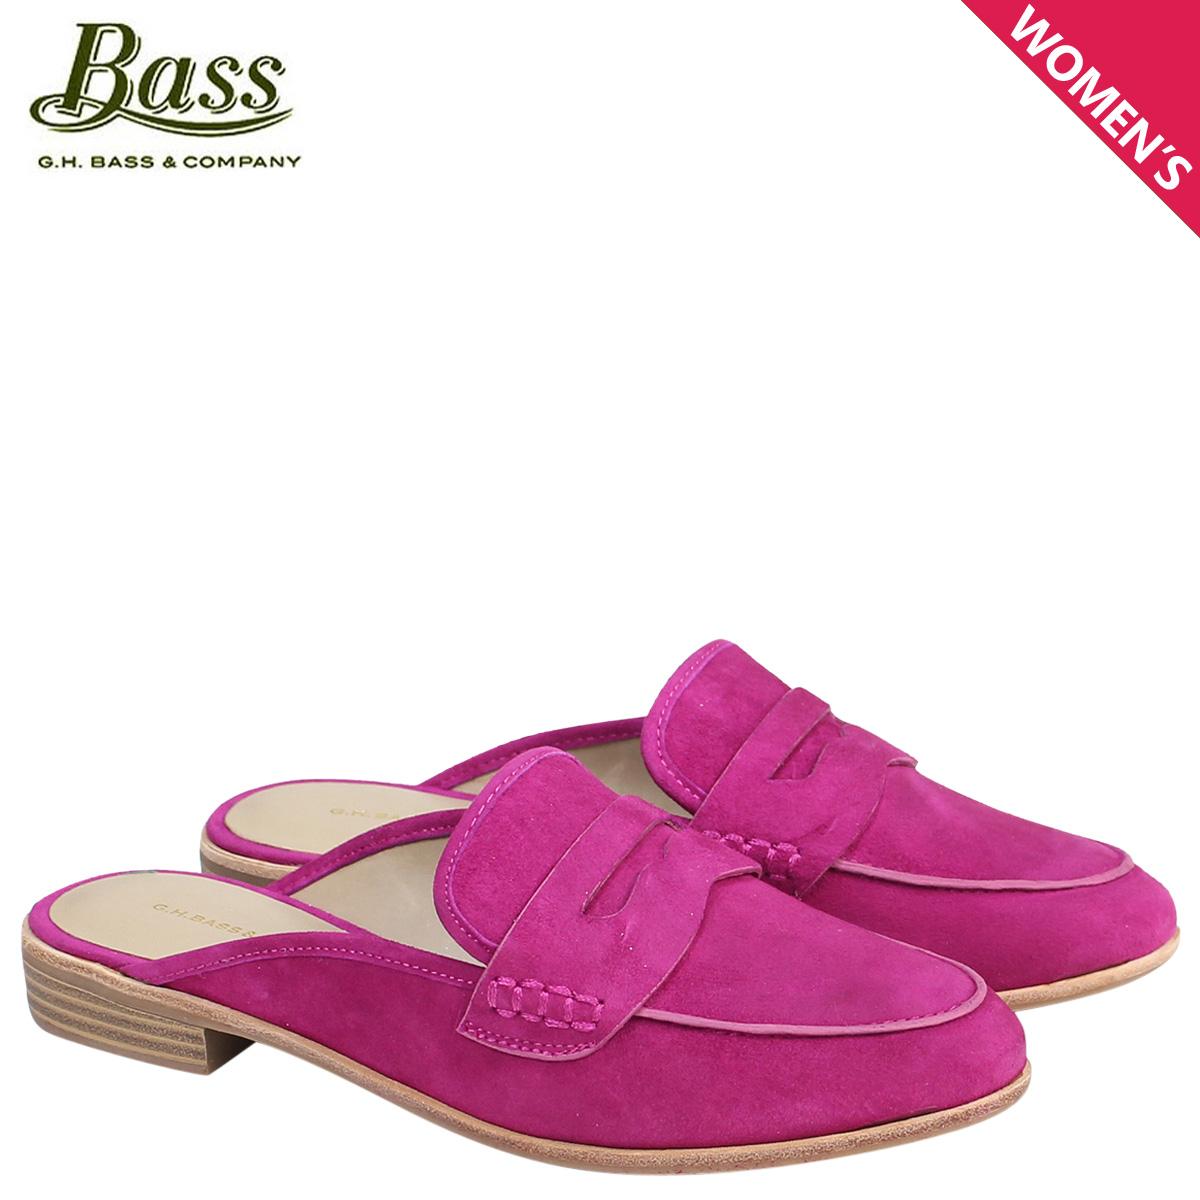 G H bus loafer G.H. BASS レディースサンダルスリッパバブーシュ ERIN MULE 71-21,388 shoes pink  [176]